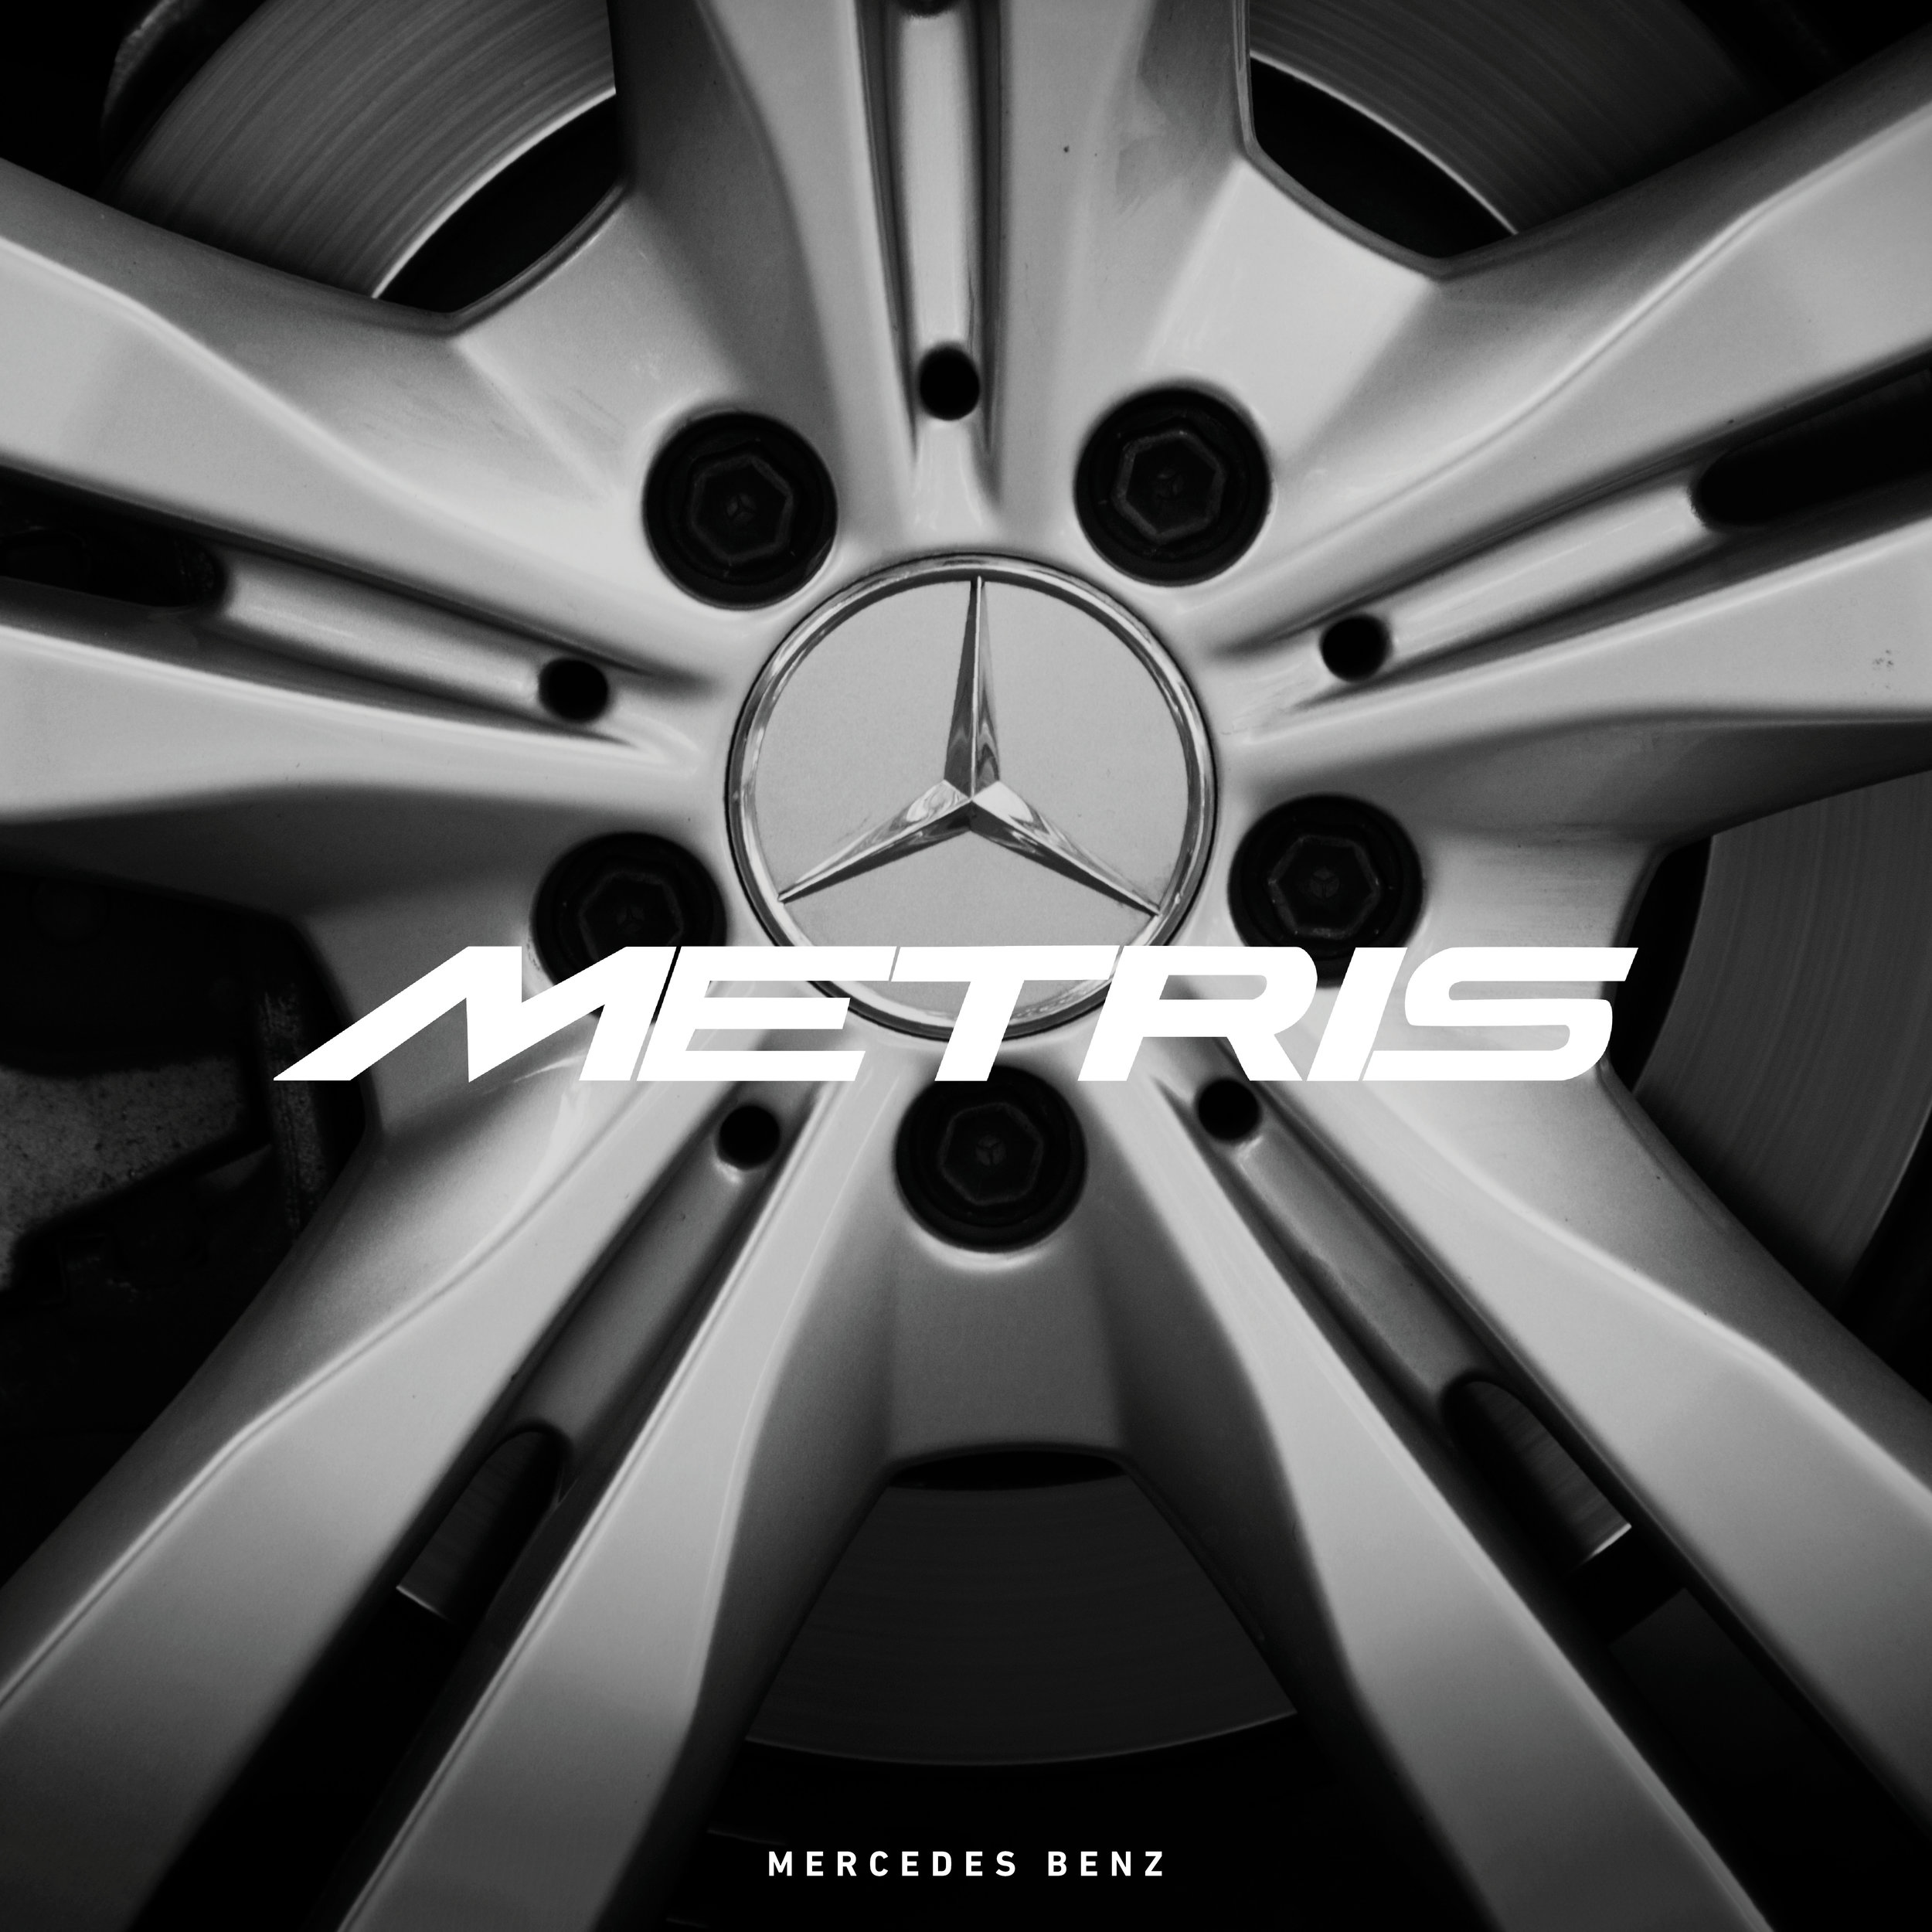 Metris (Mercedes-Benz)